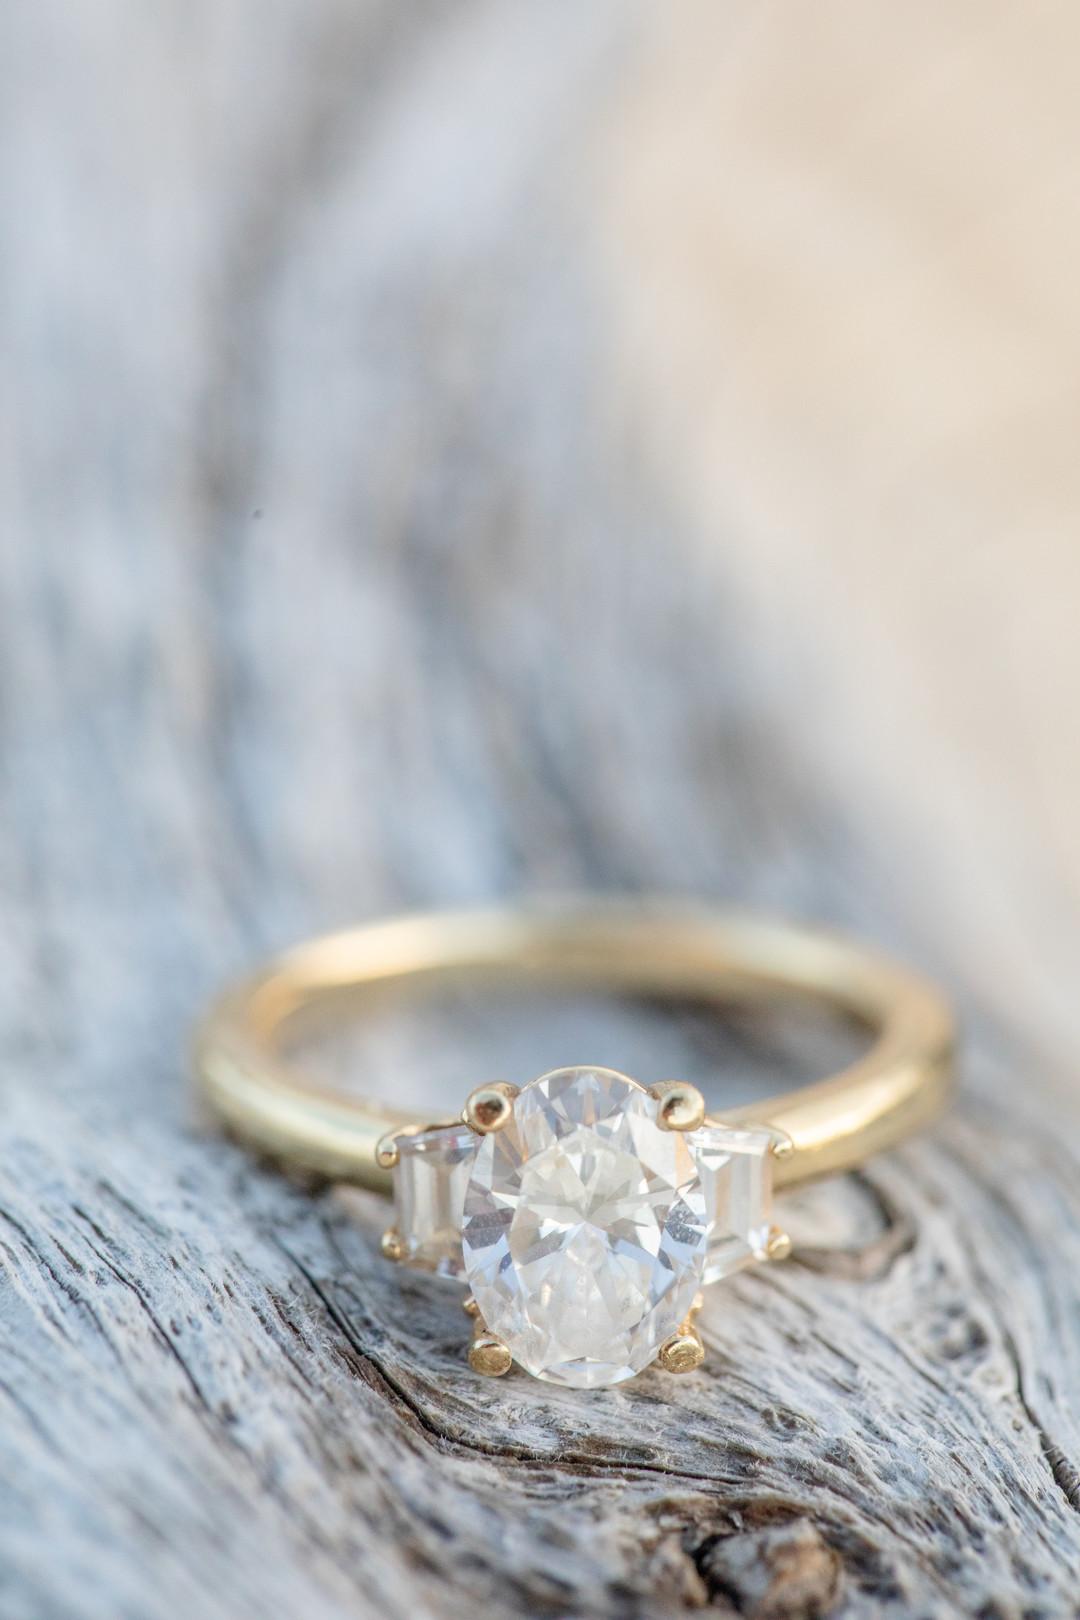 jekyll-island-wedding-engagement-photography-7.jpg